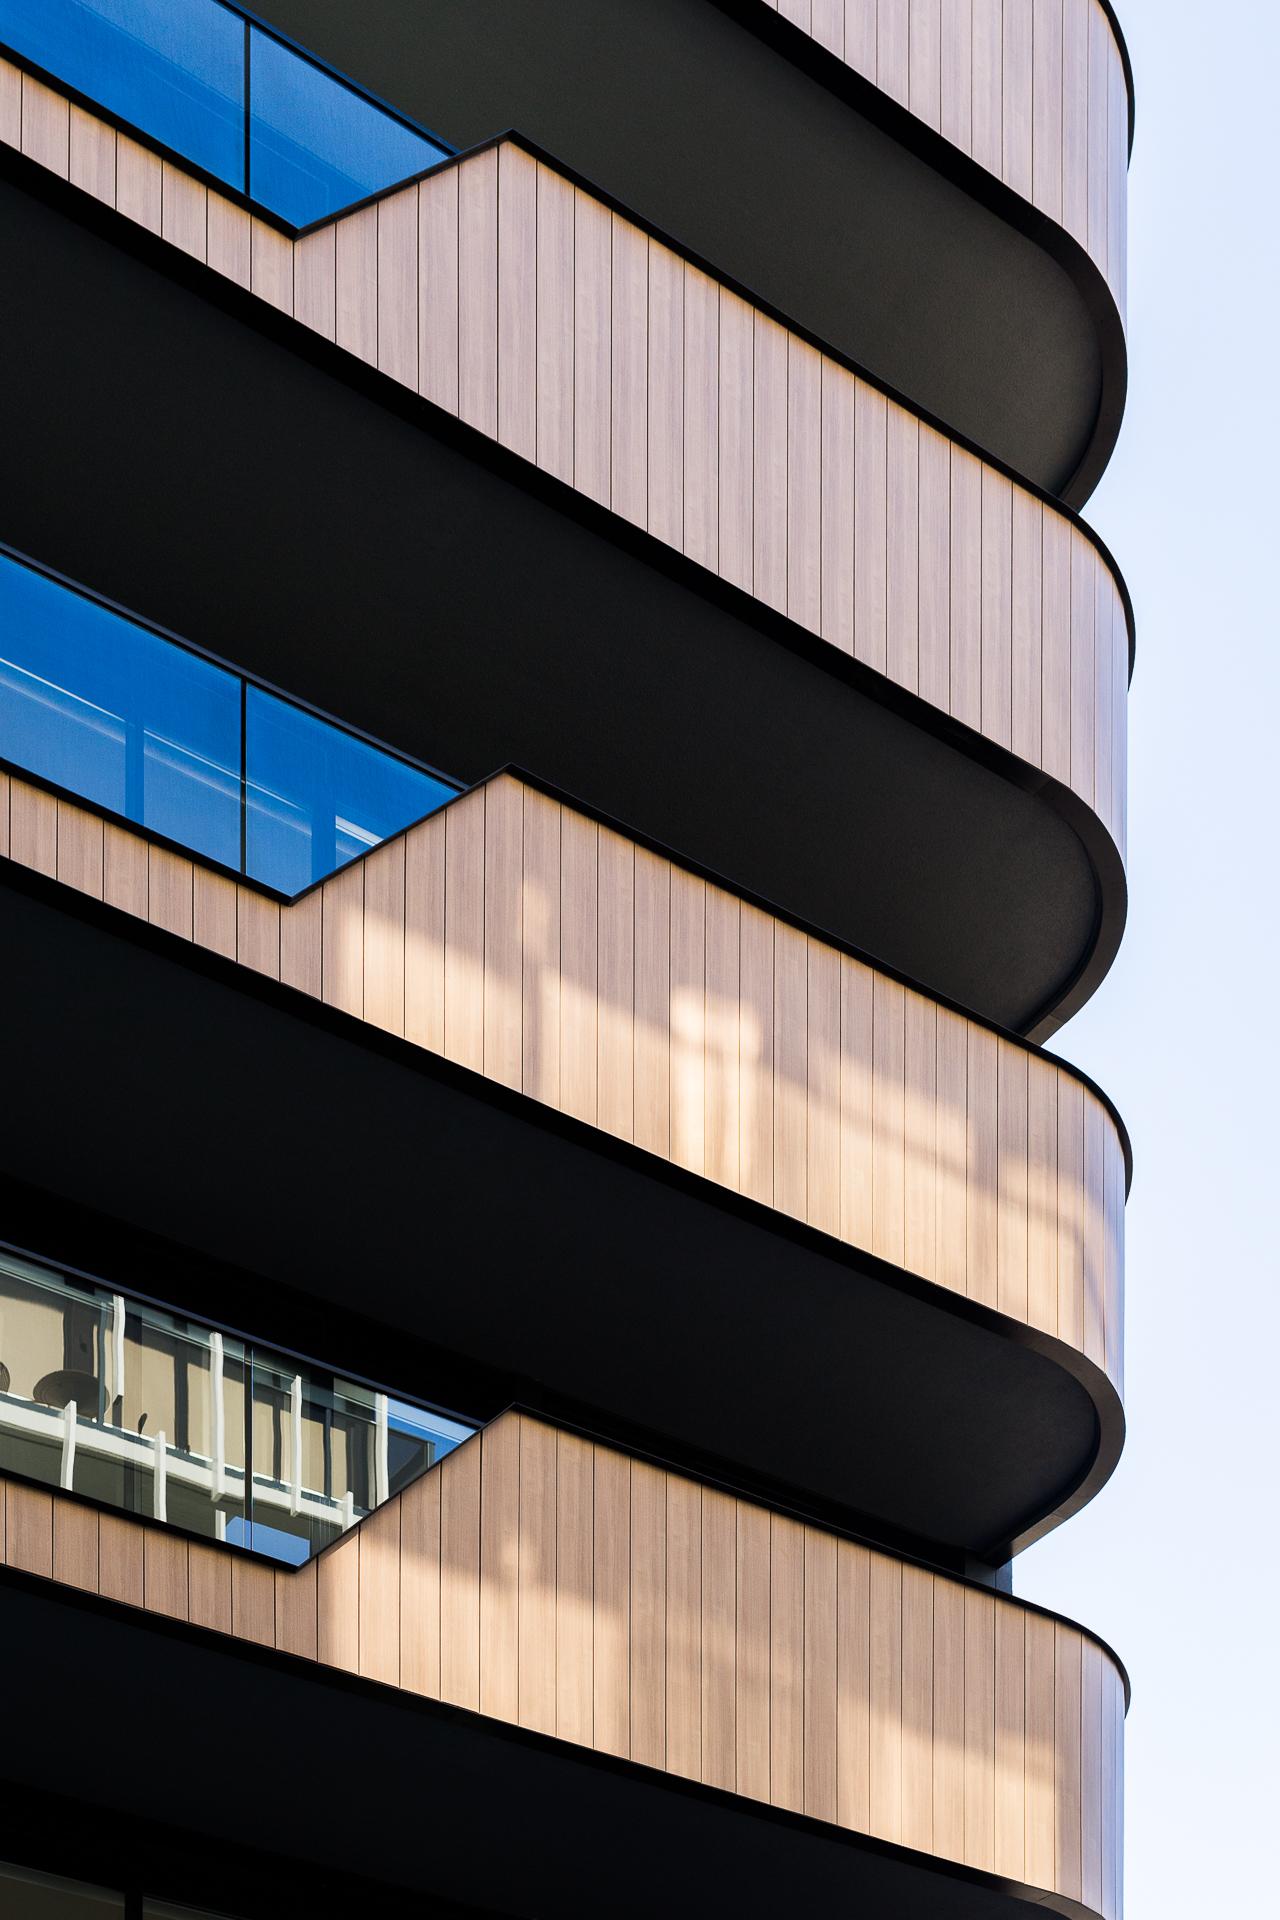 Parc Vue Multi Residential Apartments - Bundoora VIC